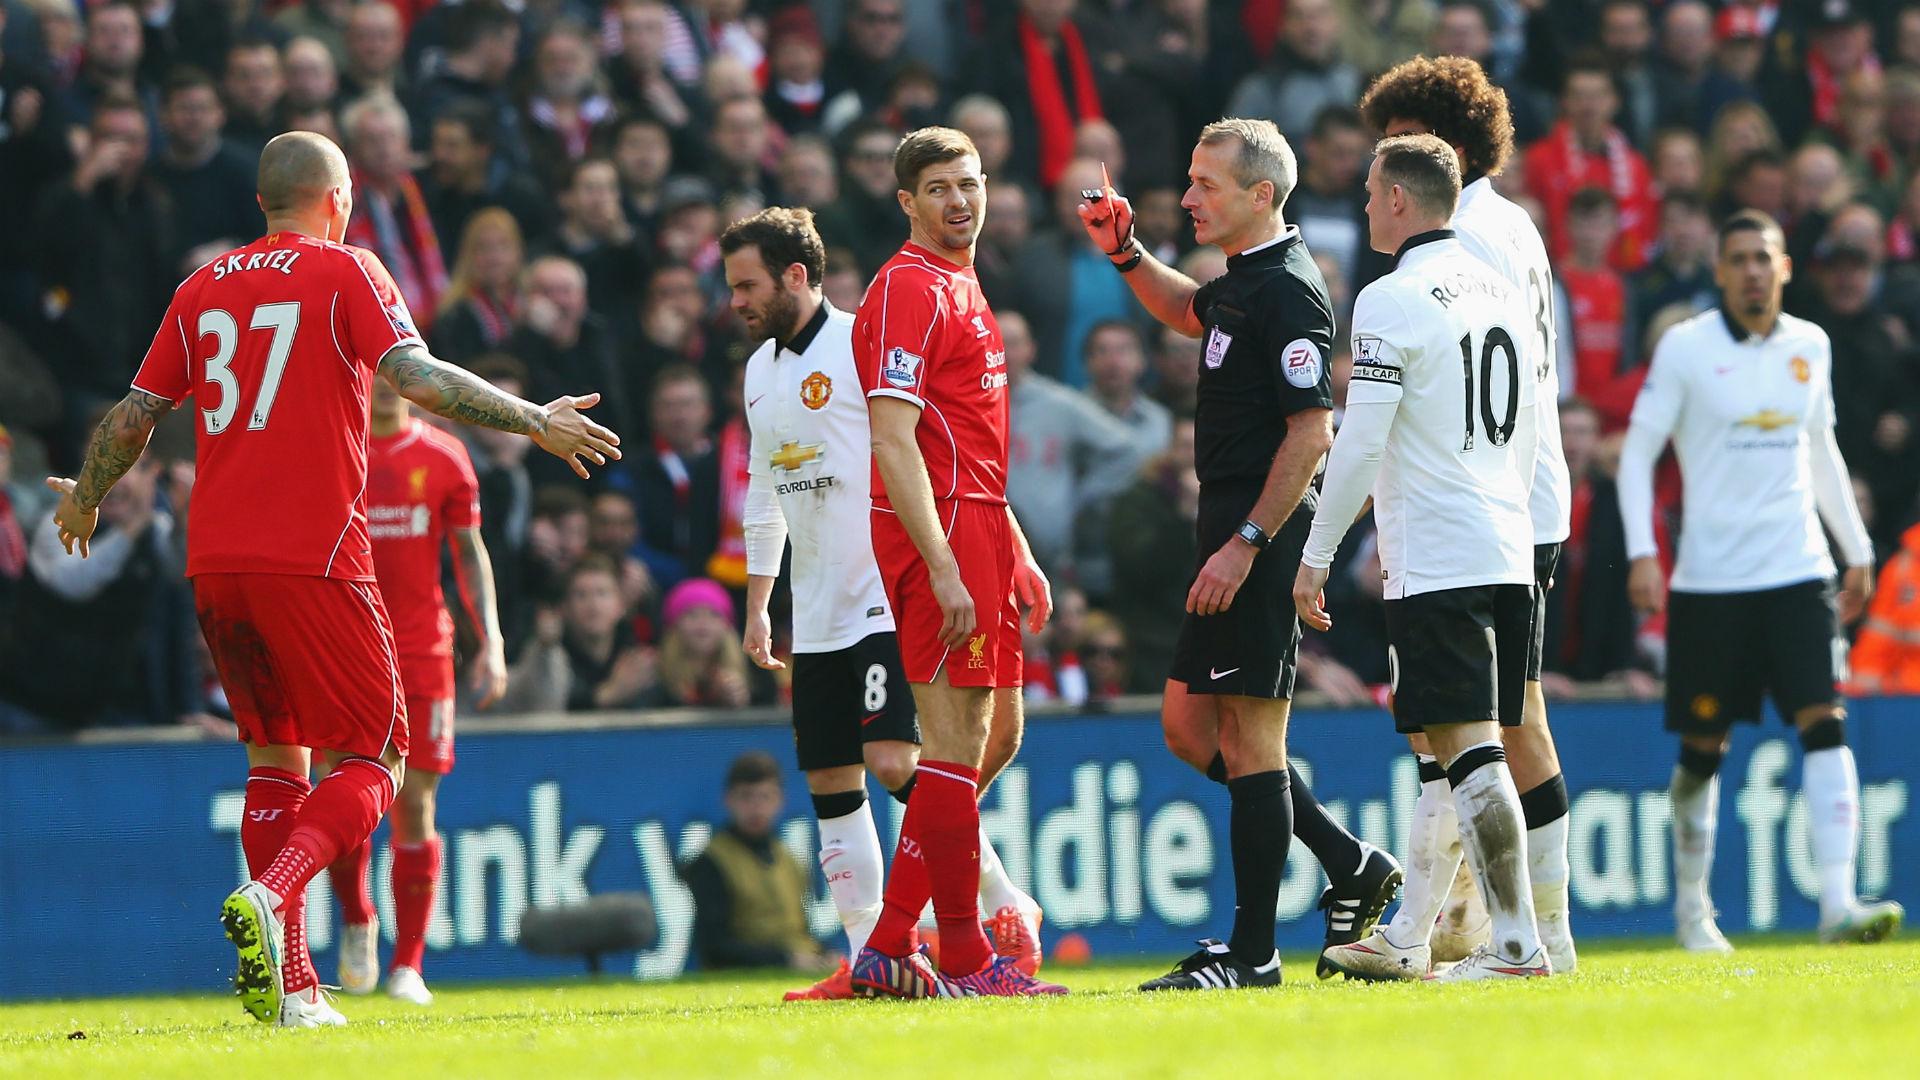 Derbi Inglés, ¿Liverpool o Manchester United?